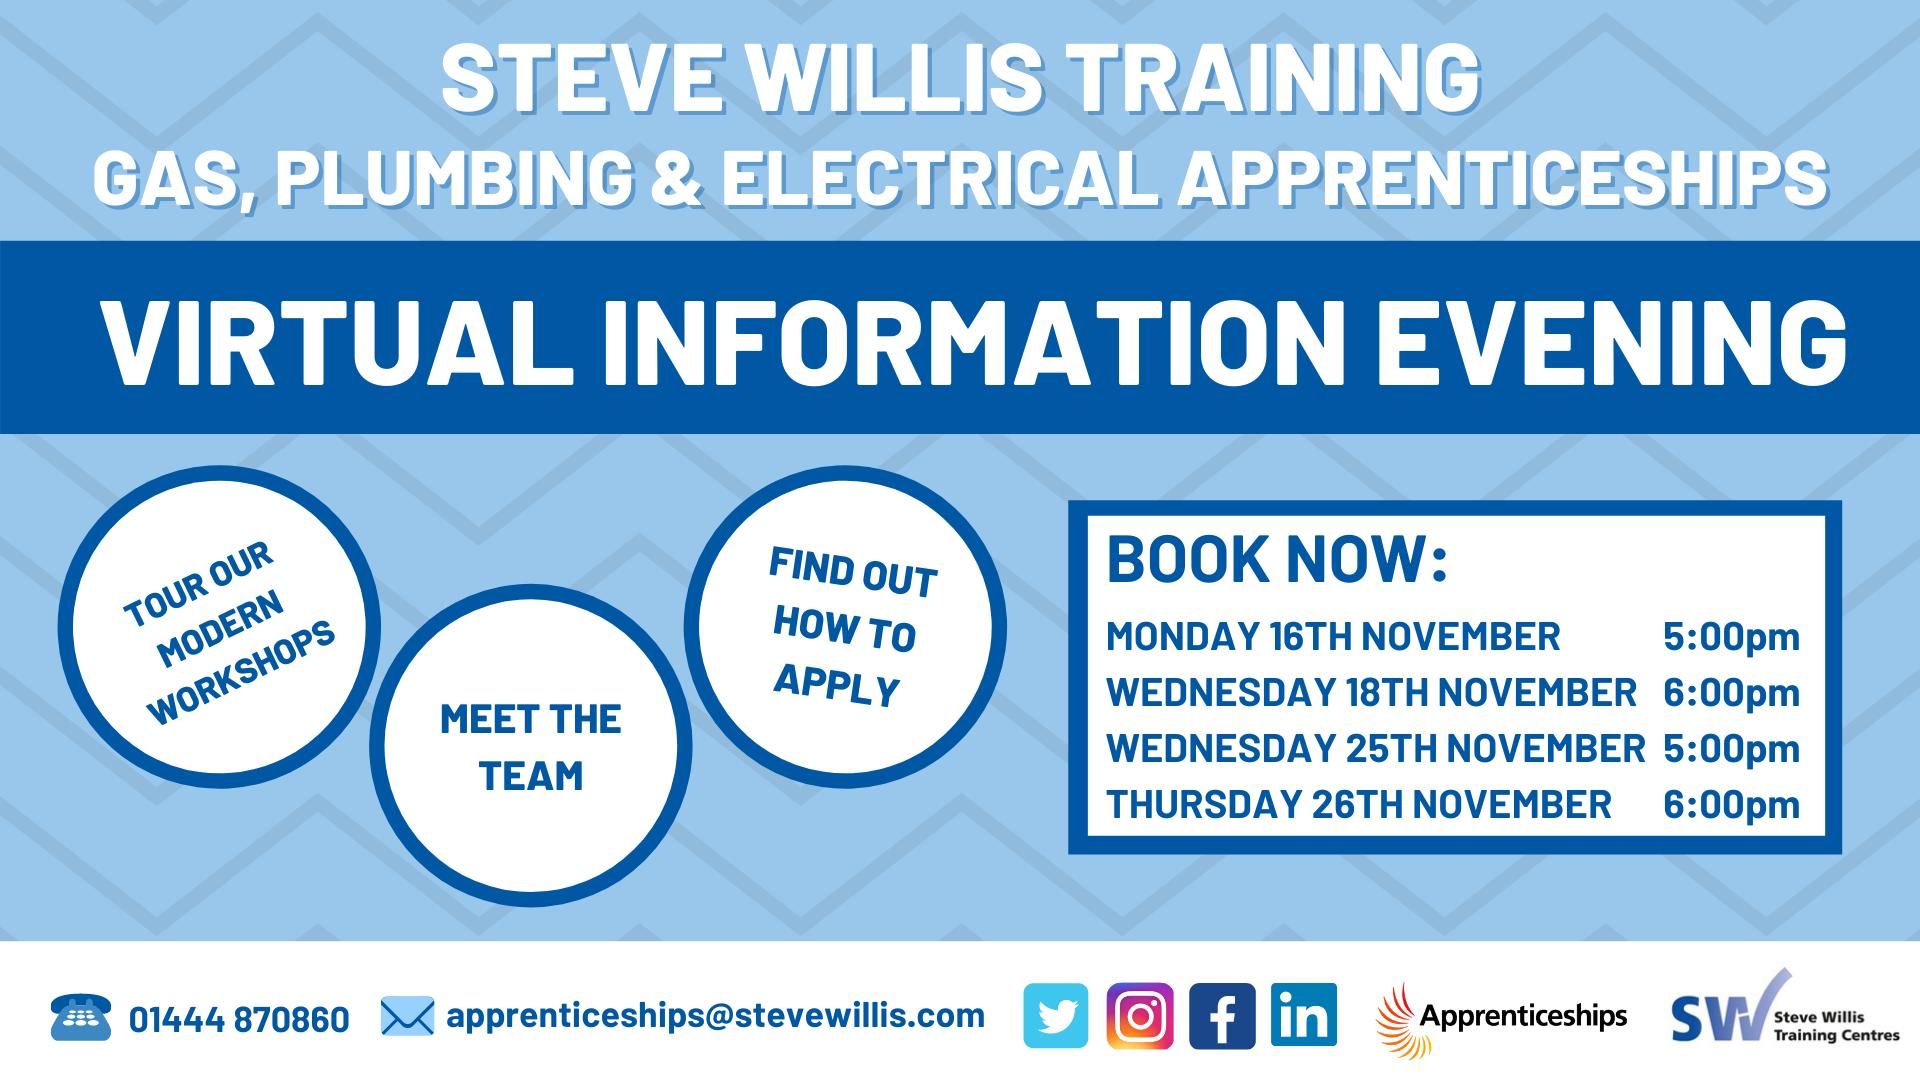 Steve Willis Virtual Information Evening